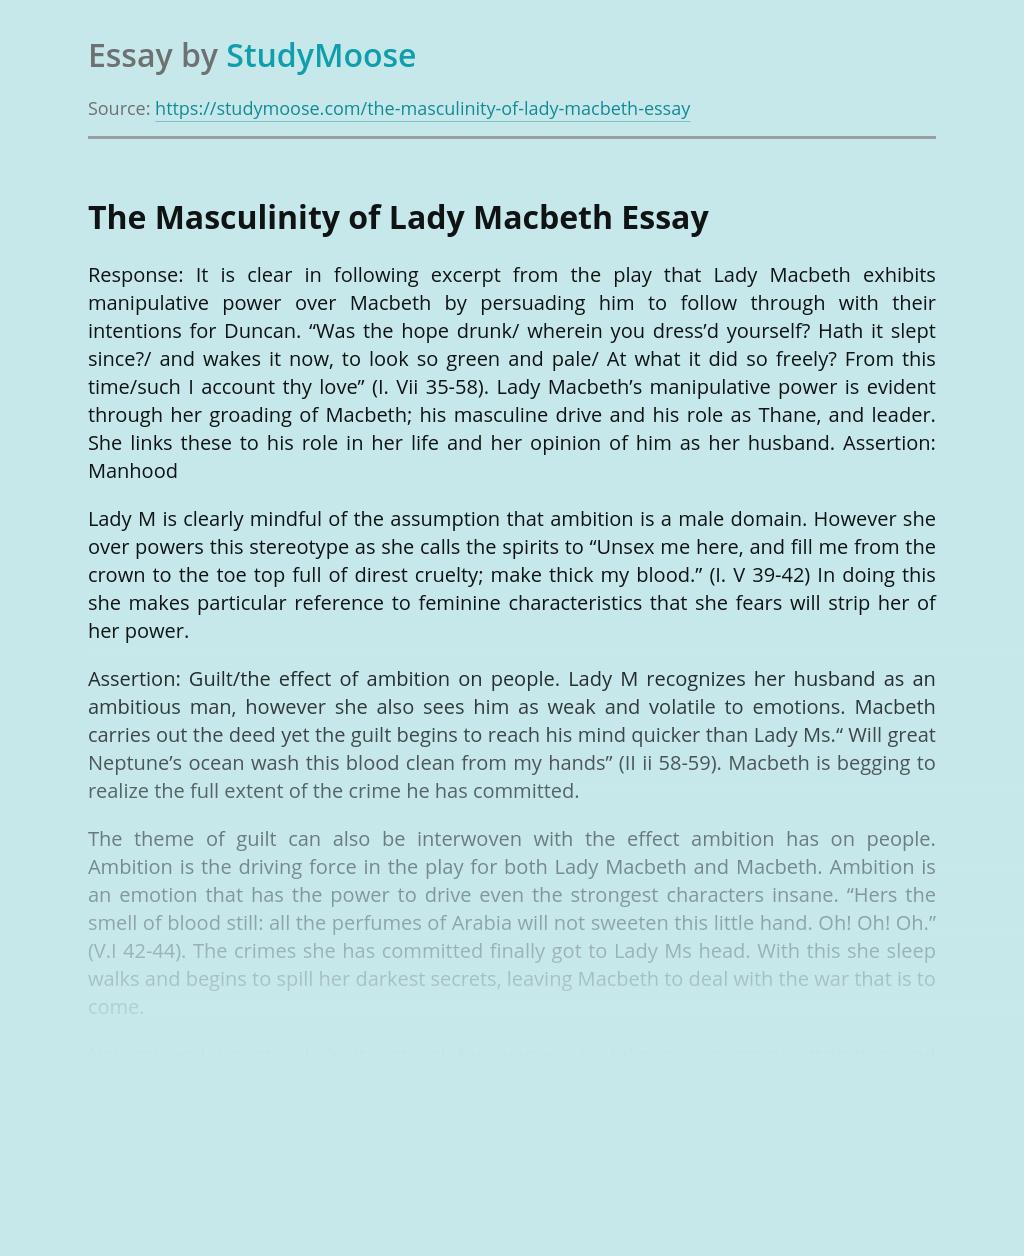 The Masculinity of Lady Macbeth